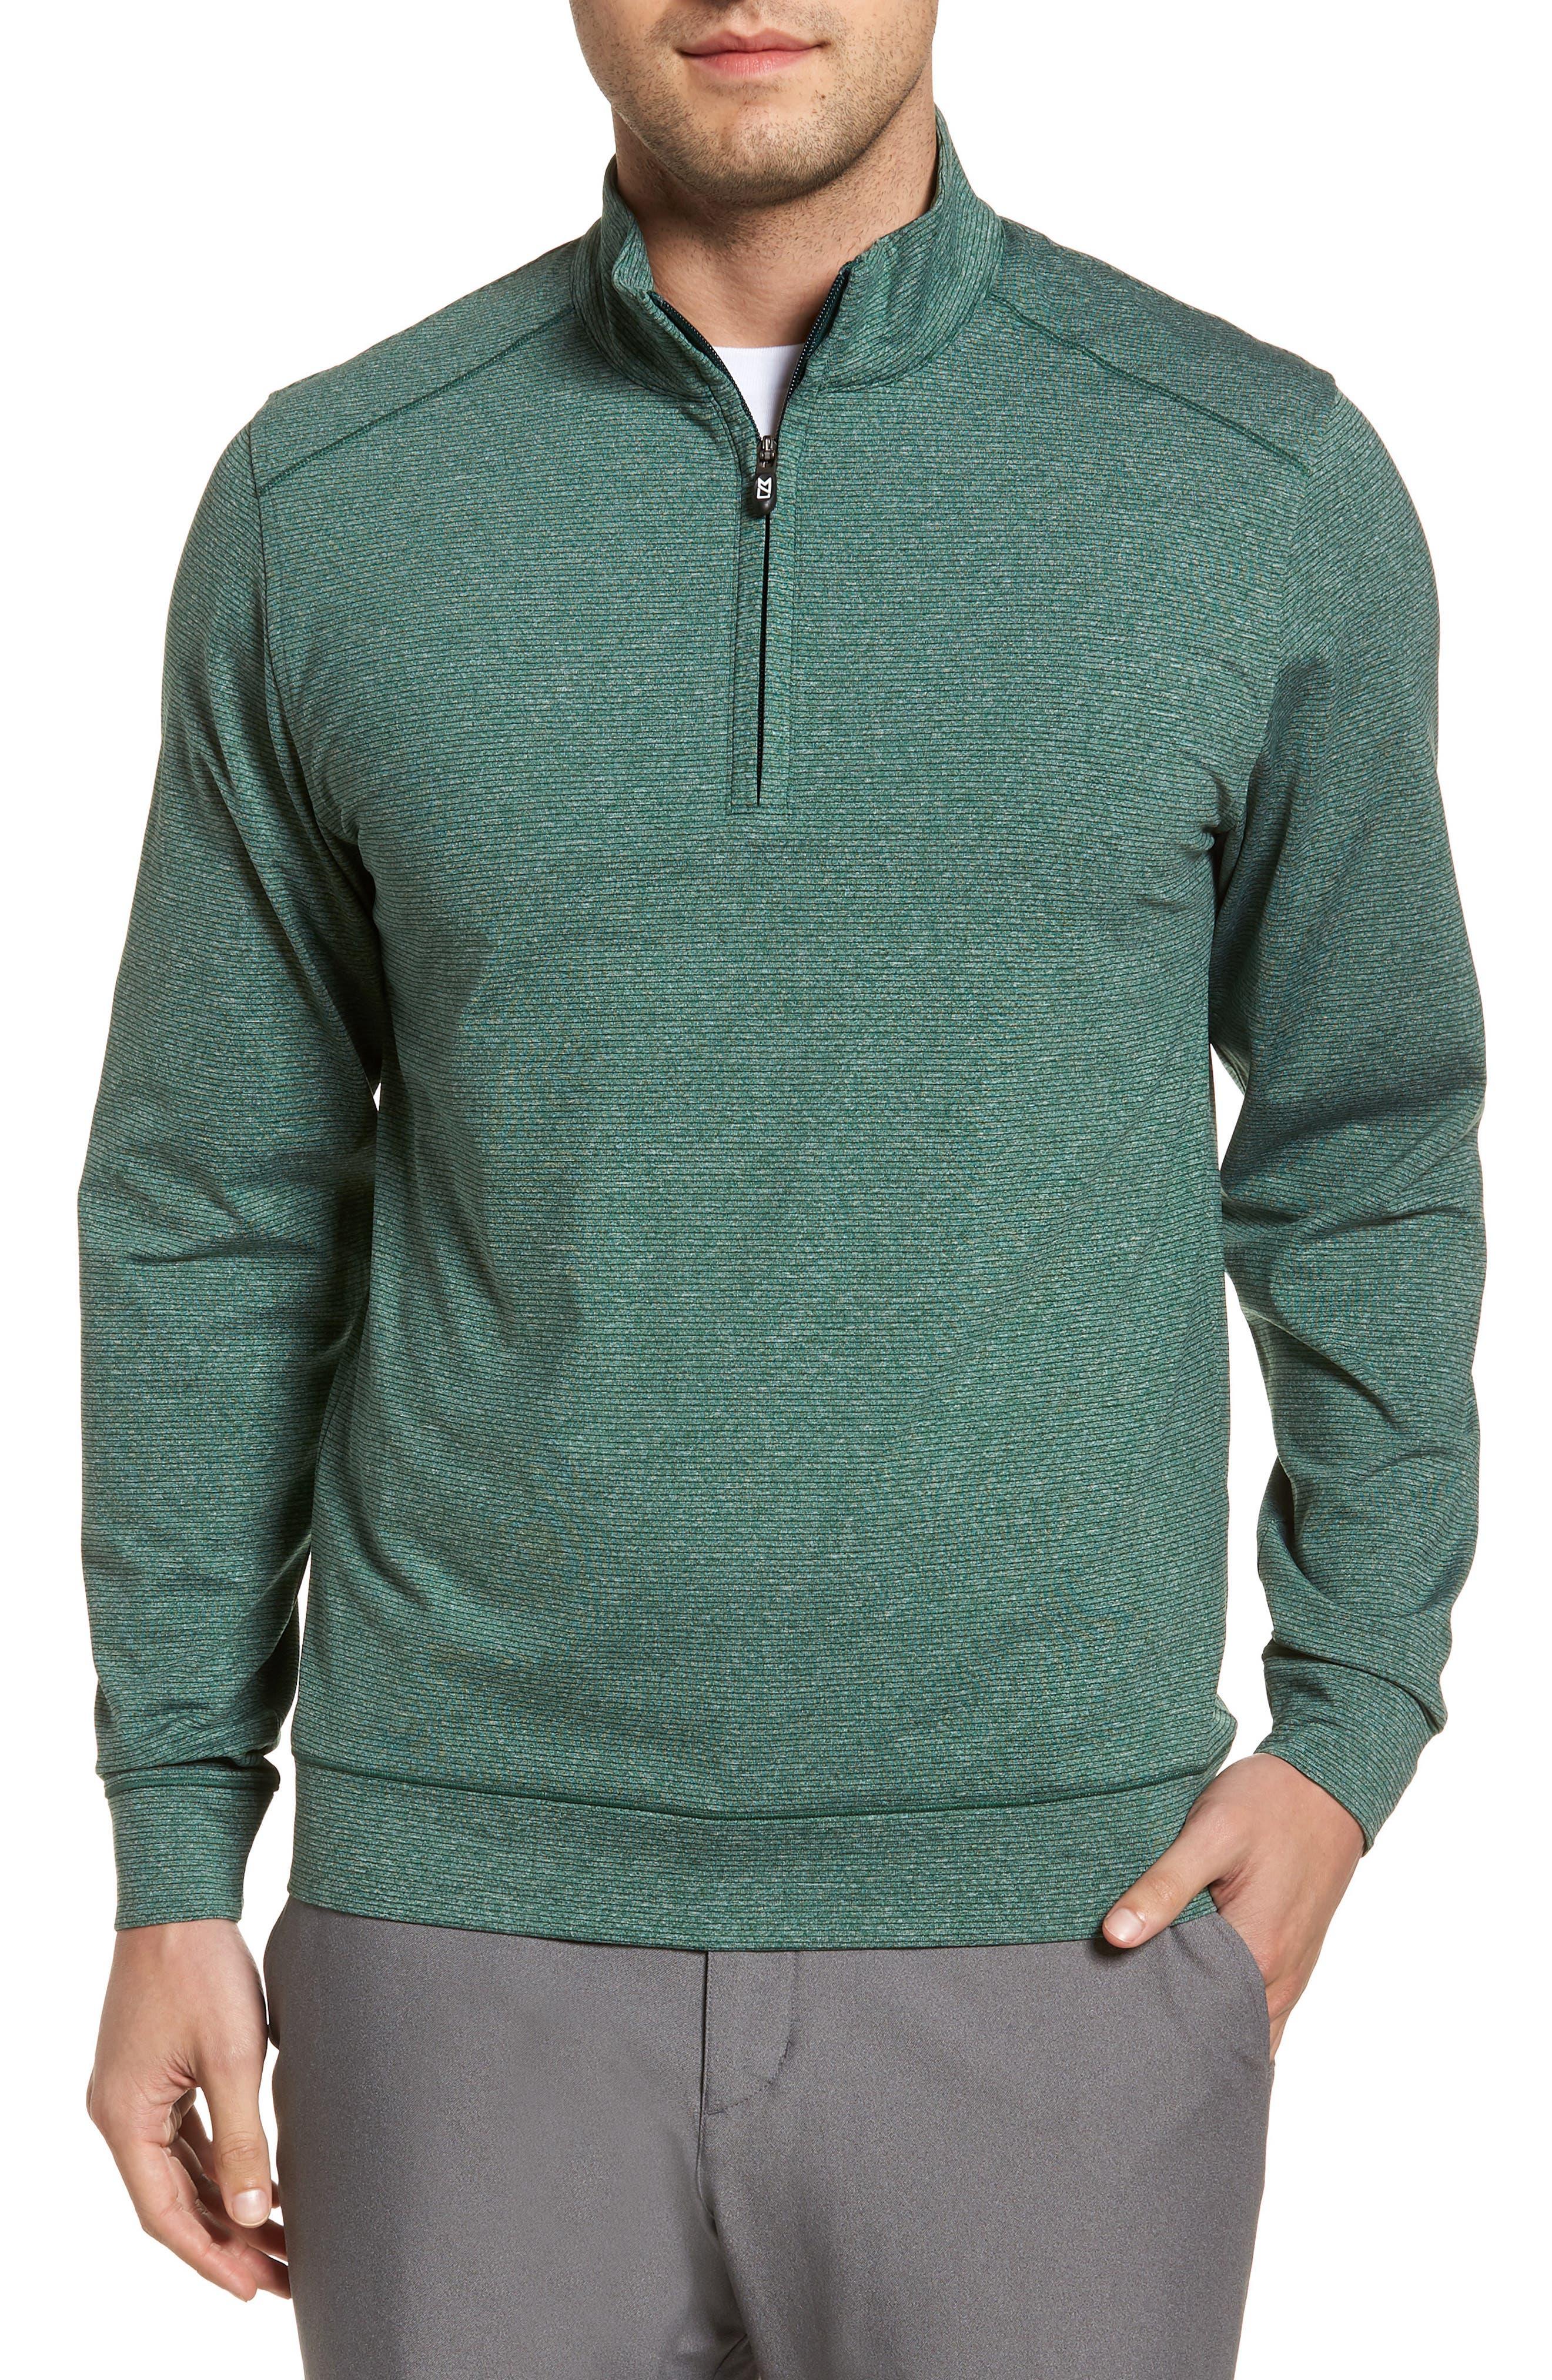 Shoreline Classic Fit Half Zip Pullover,                             Main thumbnail 1, color,                             HUNTER HEATHER